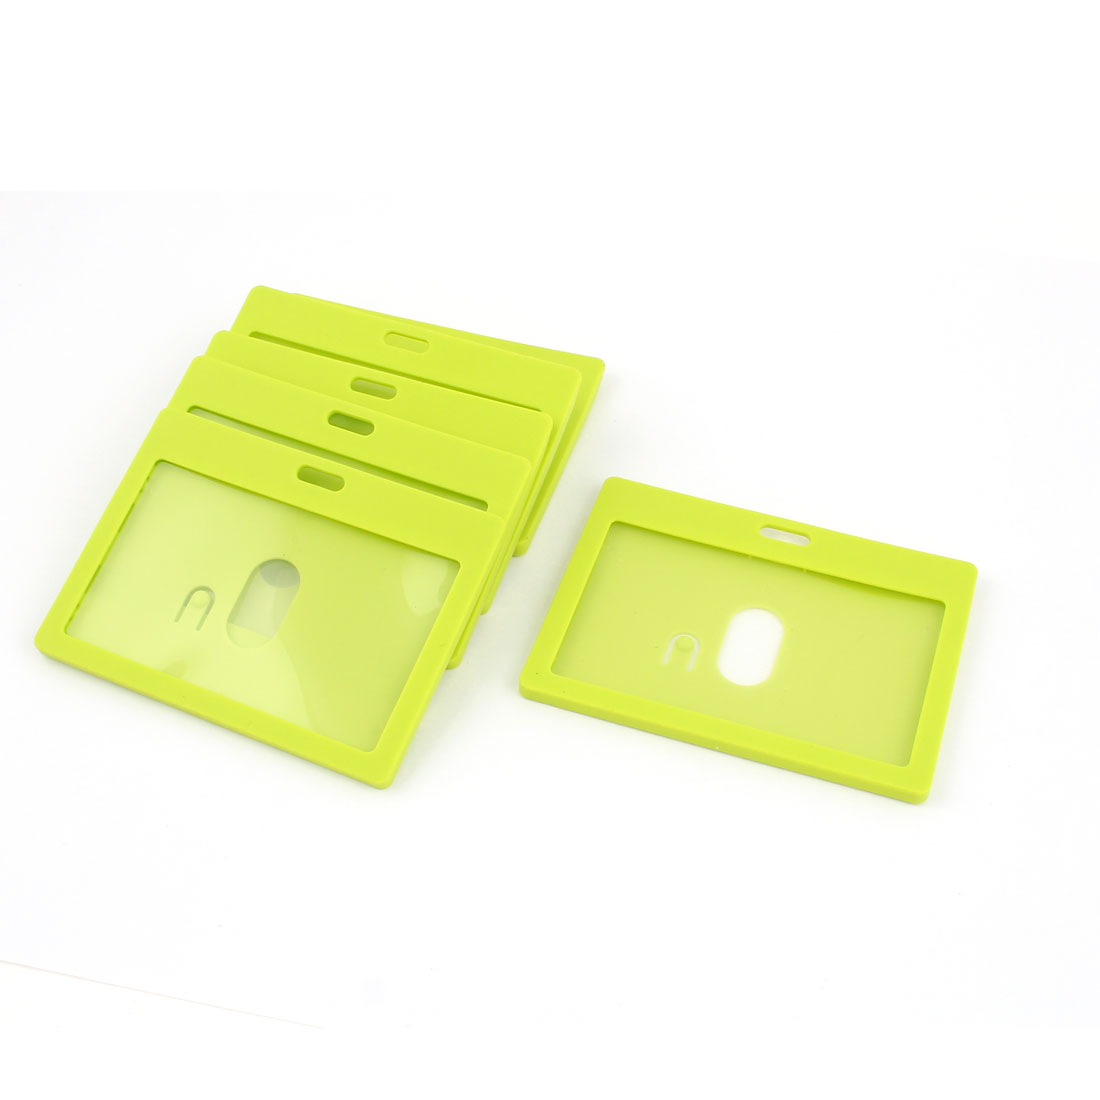 6pcs Green Plastic Horizontal School Work ID Holder Attachment Top 9cm x 5.4cm